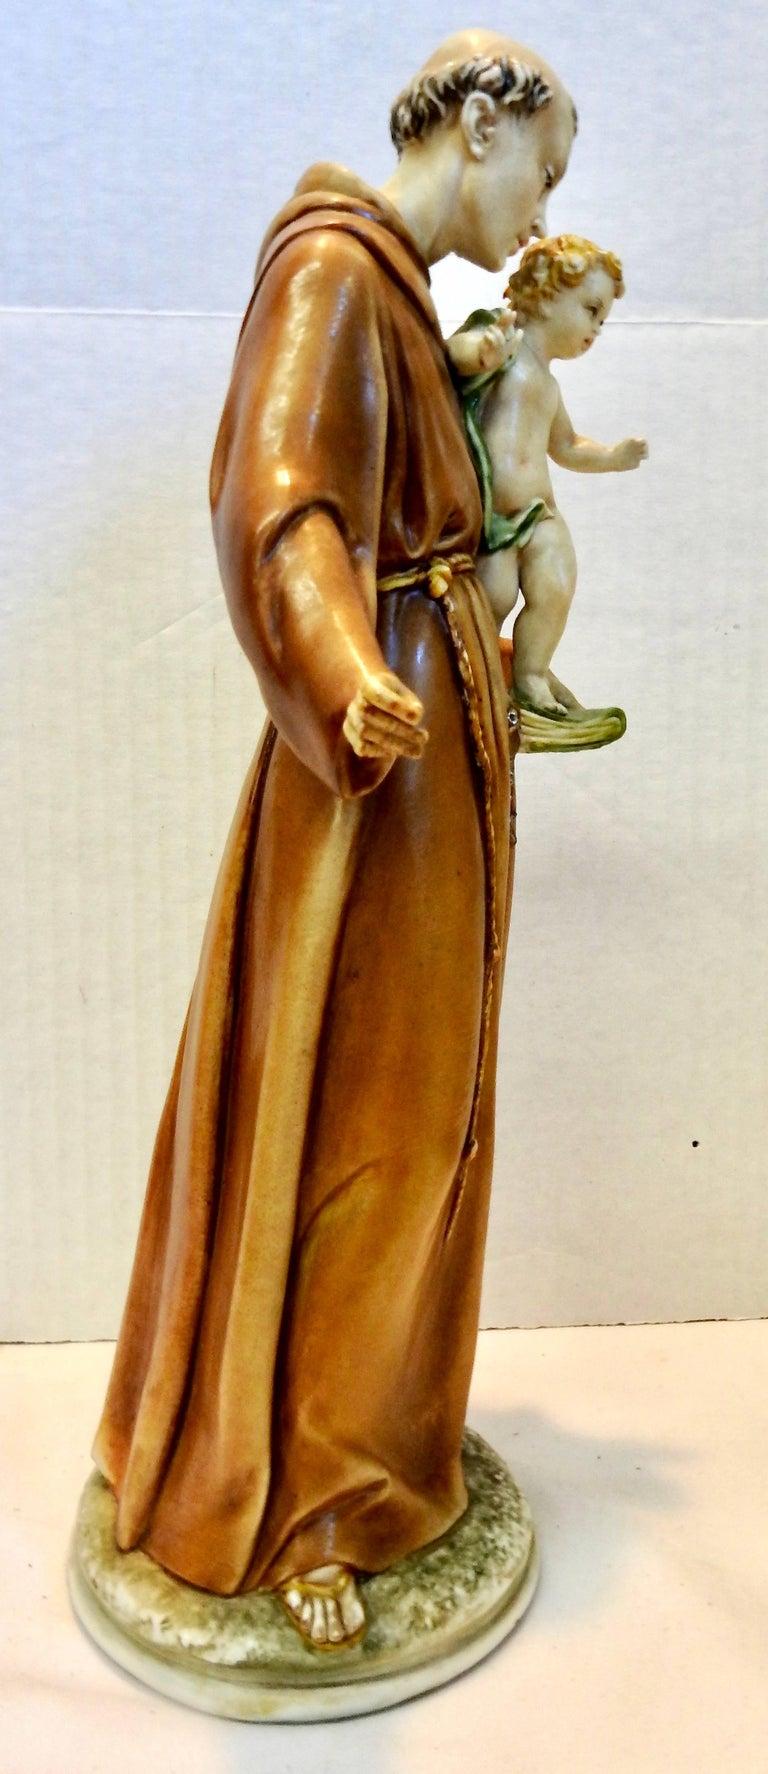 Italian Midcentury Porcelain Saint Anthony by Antonia Borsato For Sale